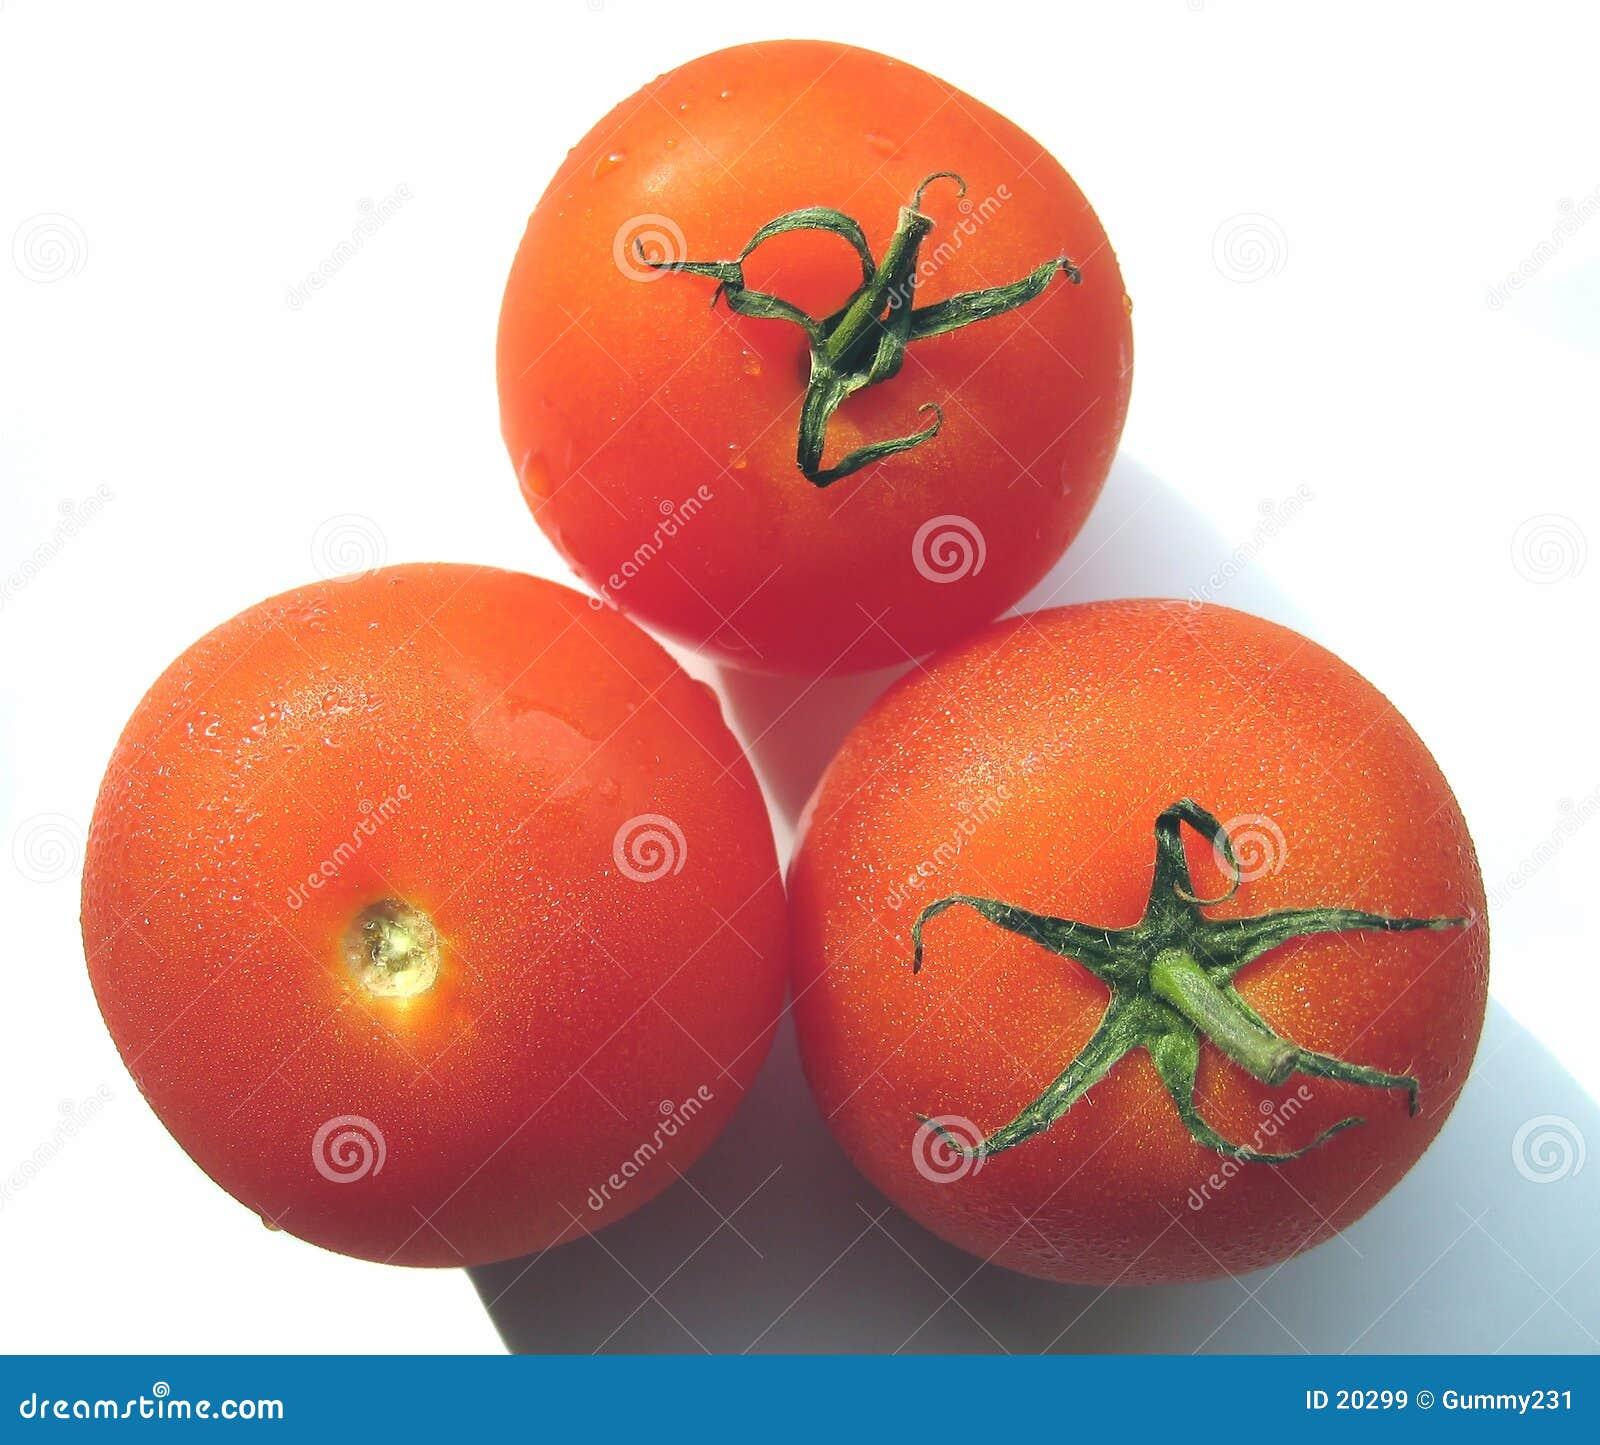 Les trois tomates